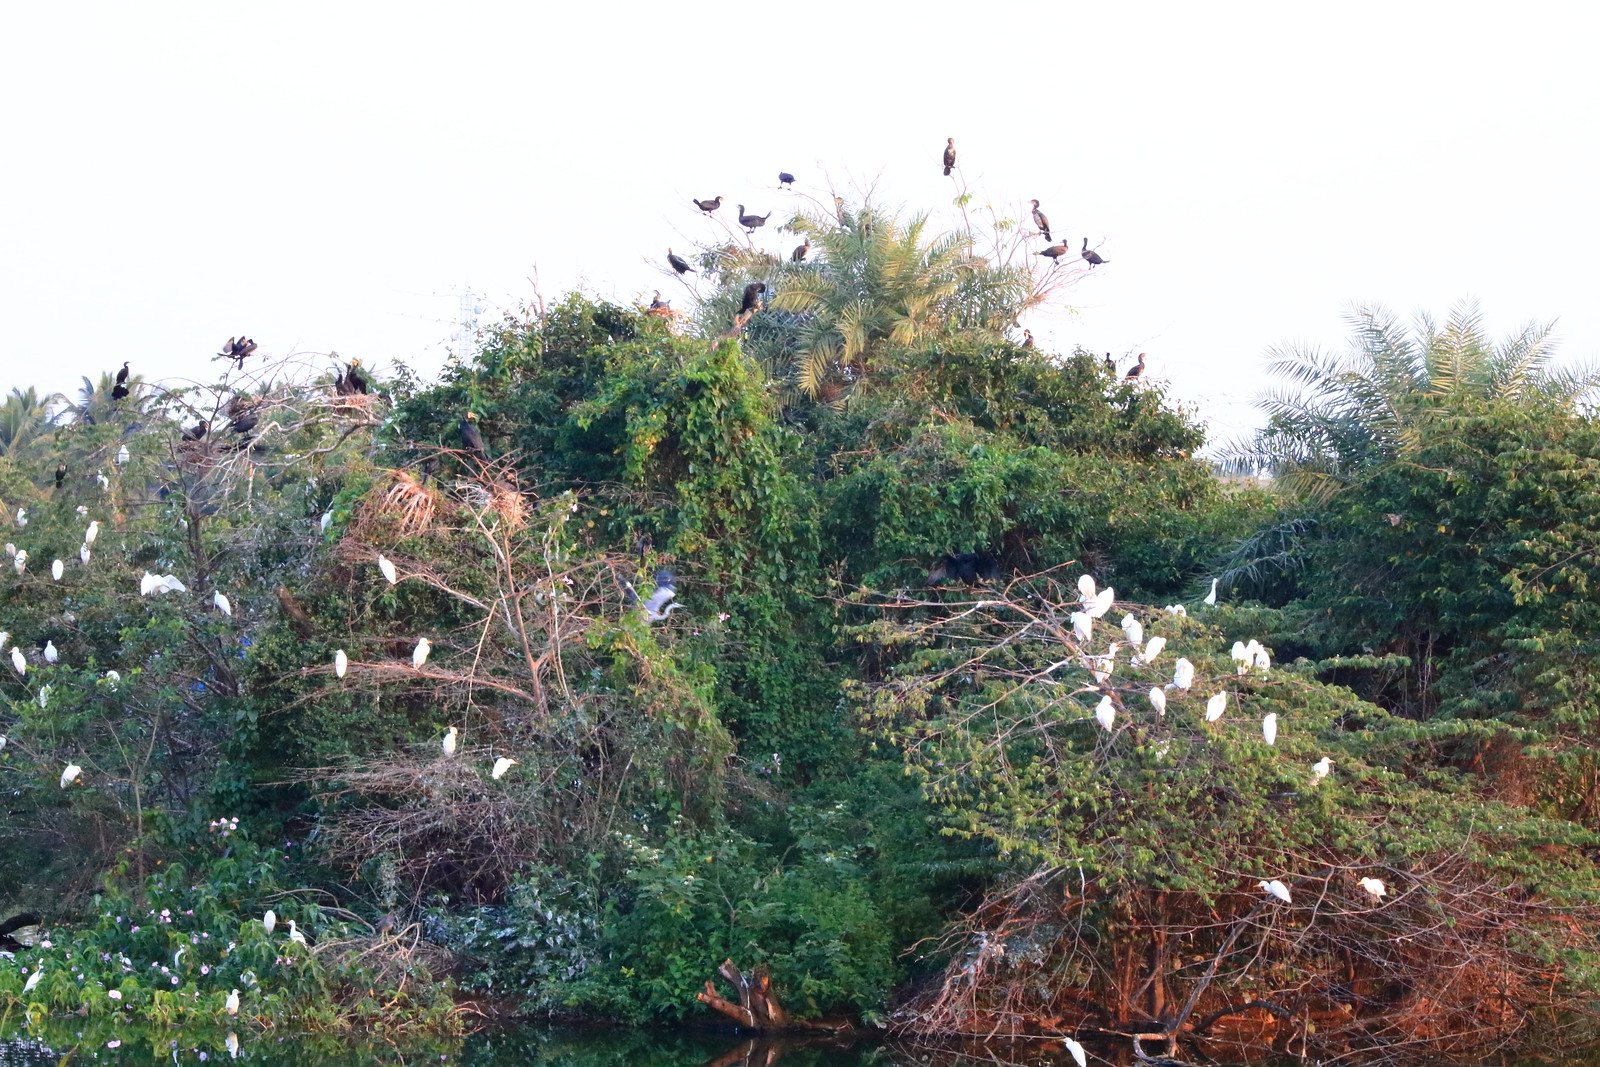 Egrets and little cormorants